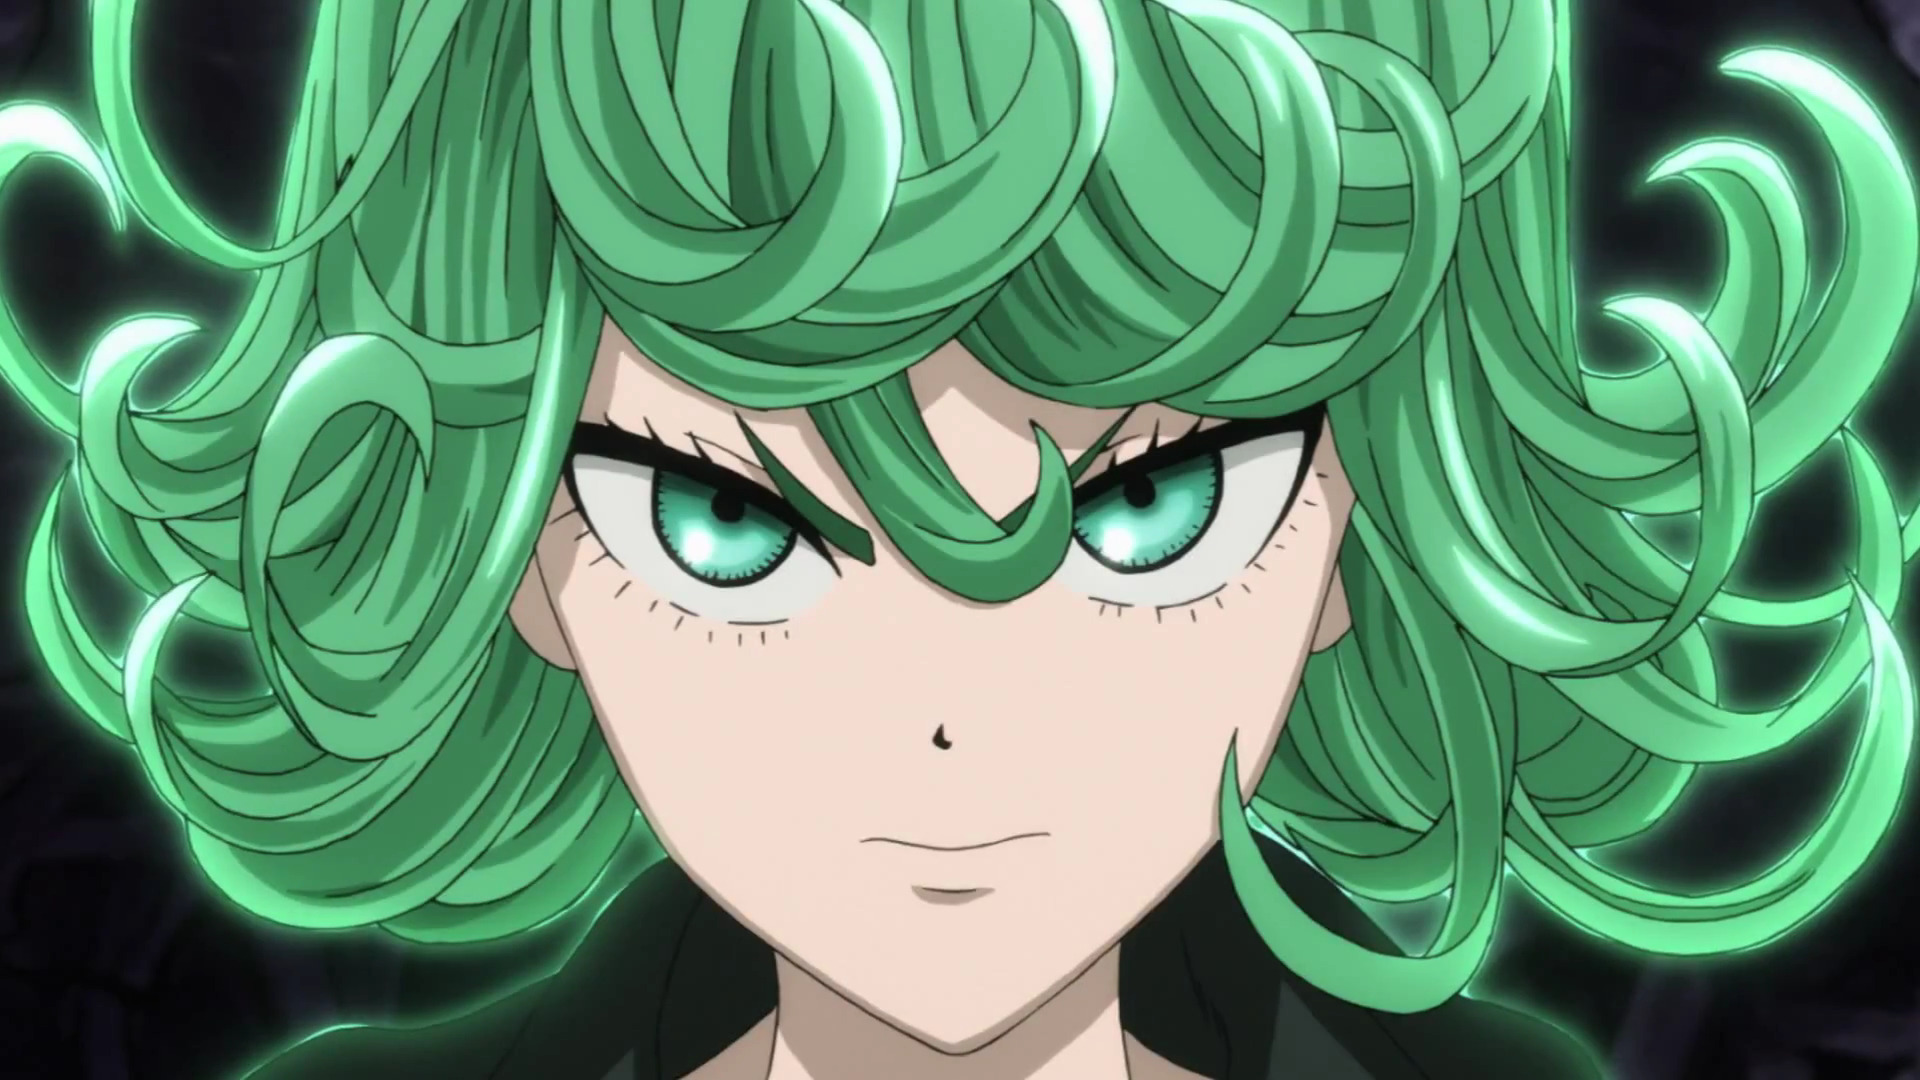 Tatsumaki One Punch Man Comic Vs Anime Vs Cartoon Wiki Fandom